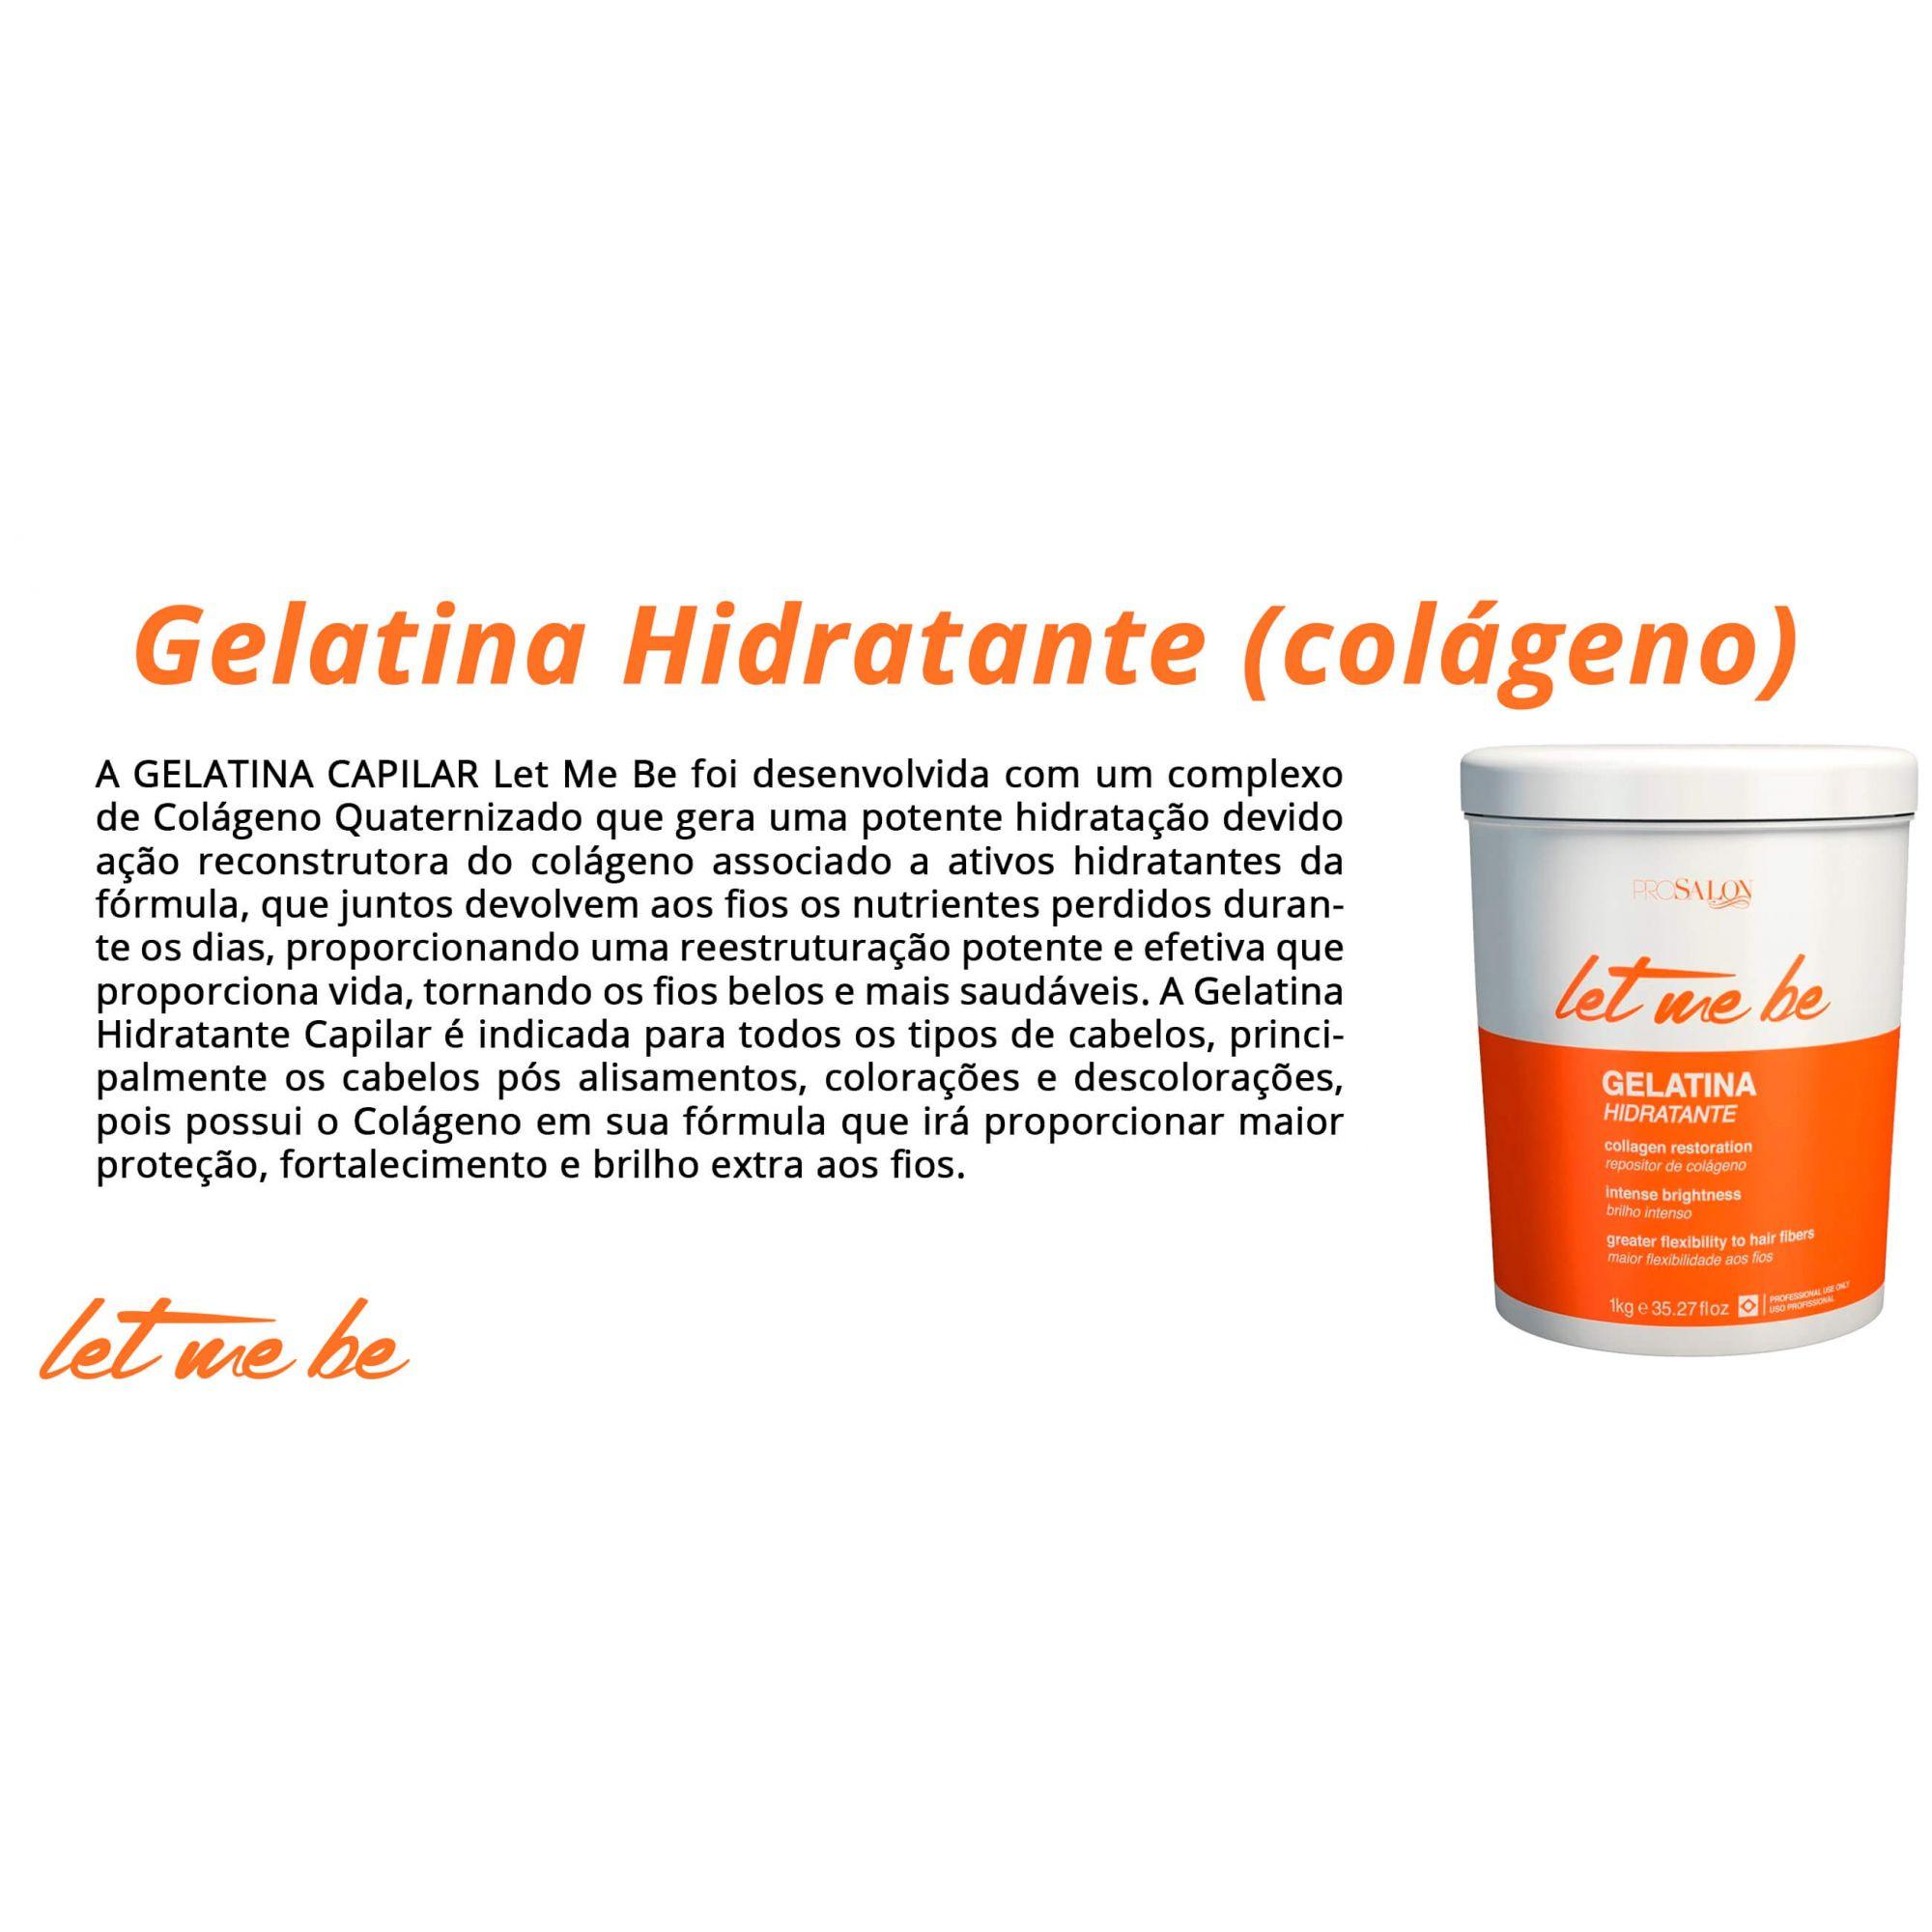 Gelatina Hidratante - Colágeno - Let Me Be 1kg